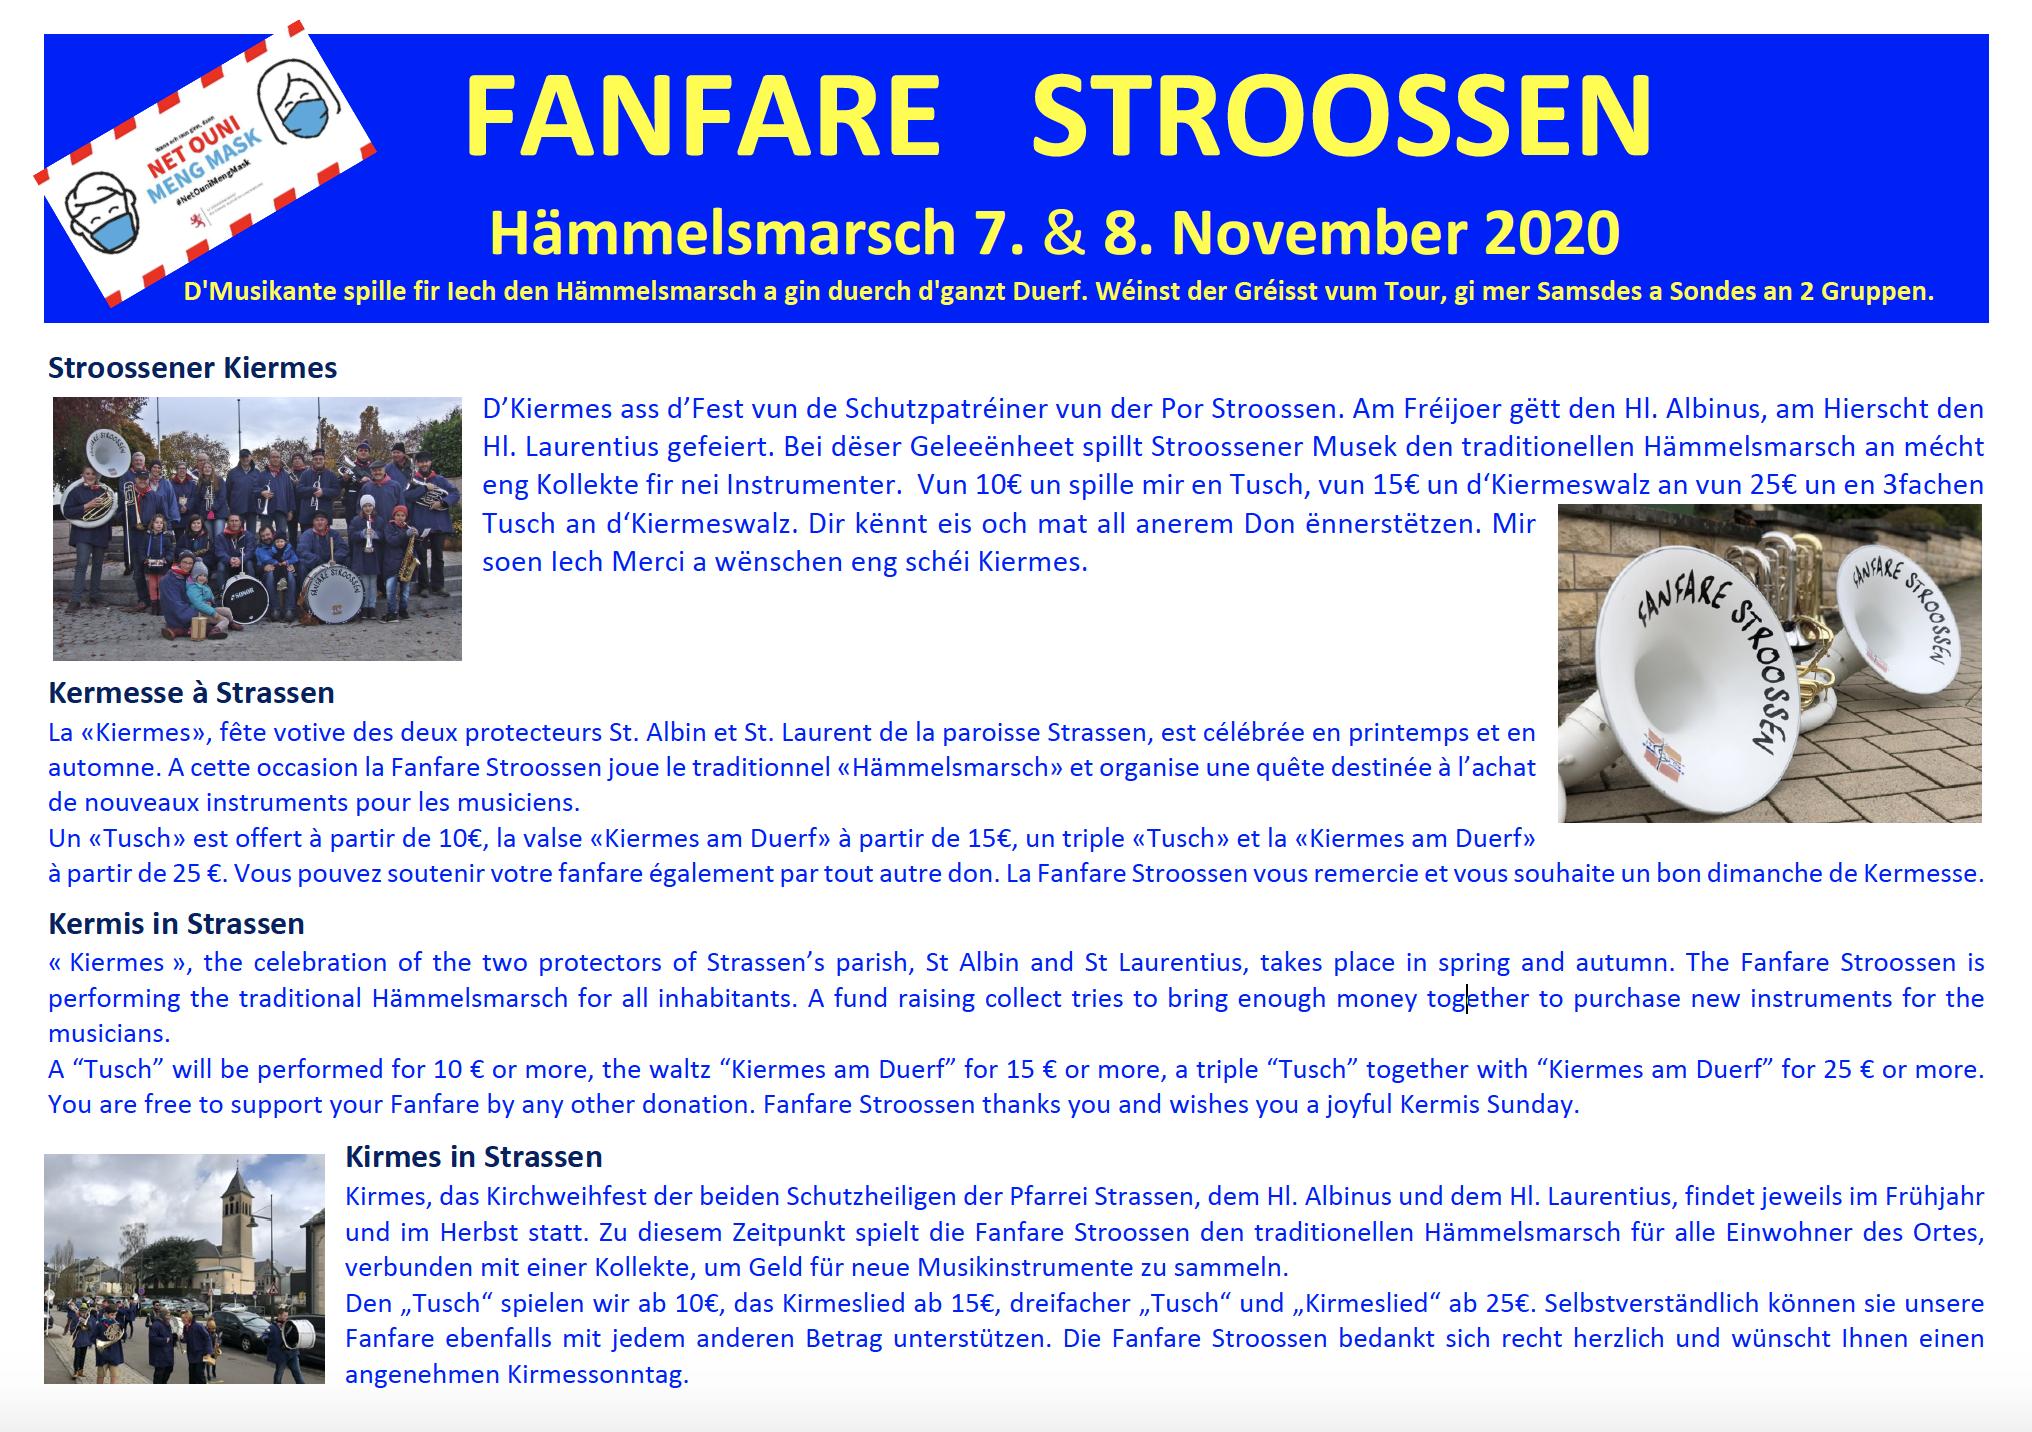 Hämmelsmarsch zu Stroossen 7. & 8. November 2020